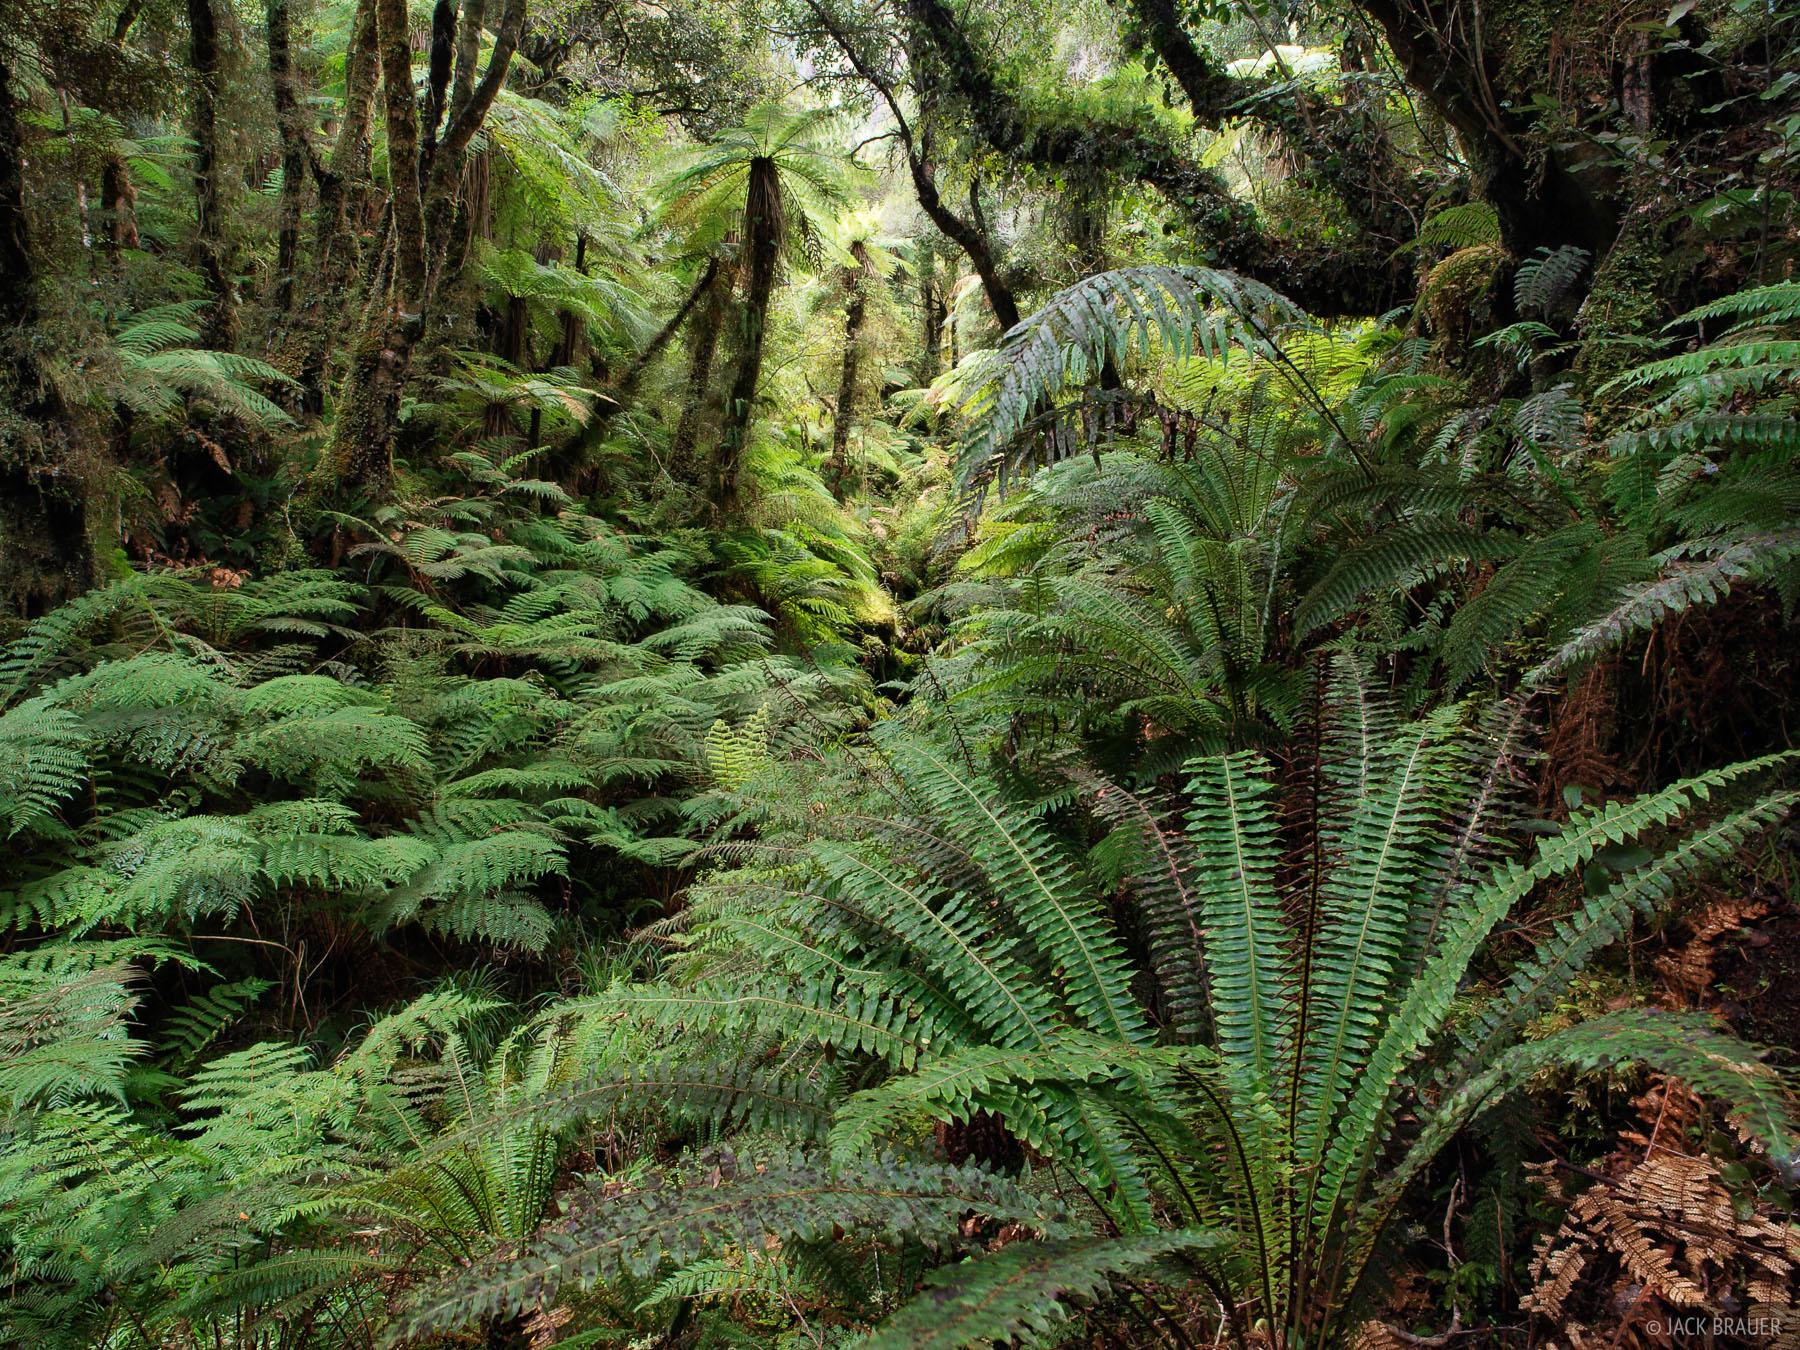 Copeland Track, rainforest, ferns, New Zealand, photo